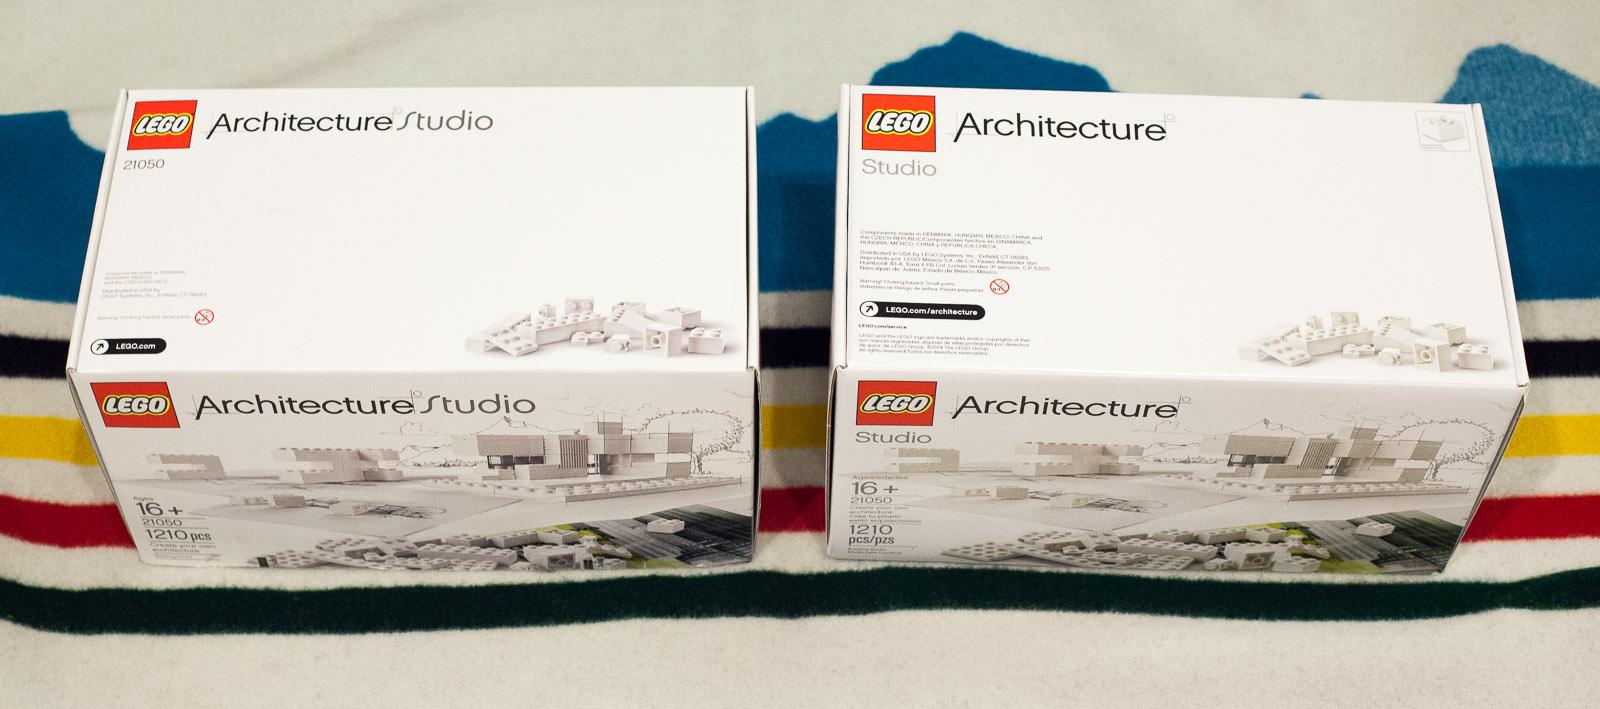 "Architecture Studio Lego minor changes in latest 21050 – ""architecture studio"" set. – tom"